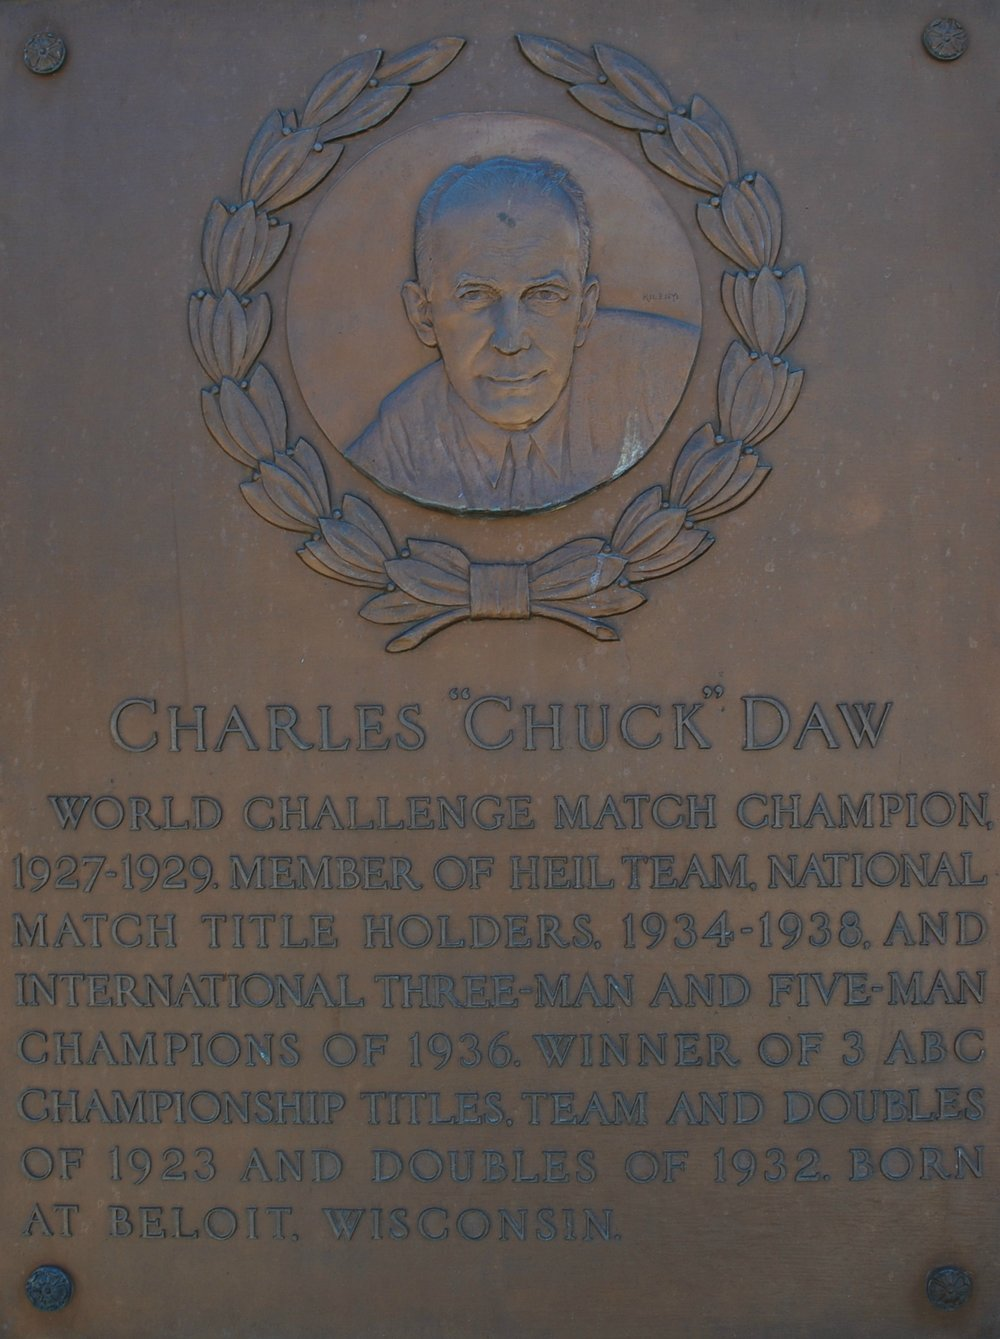 Daw Charles.jpg